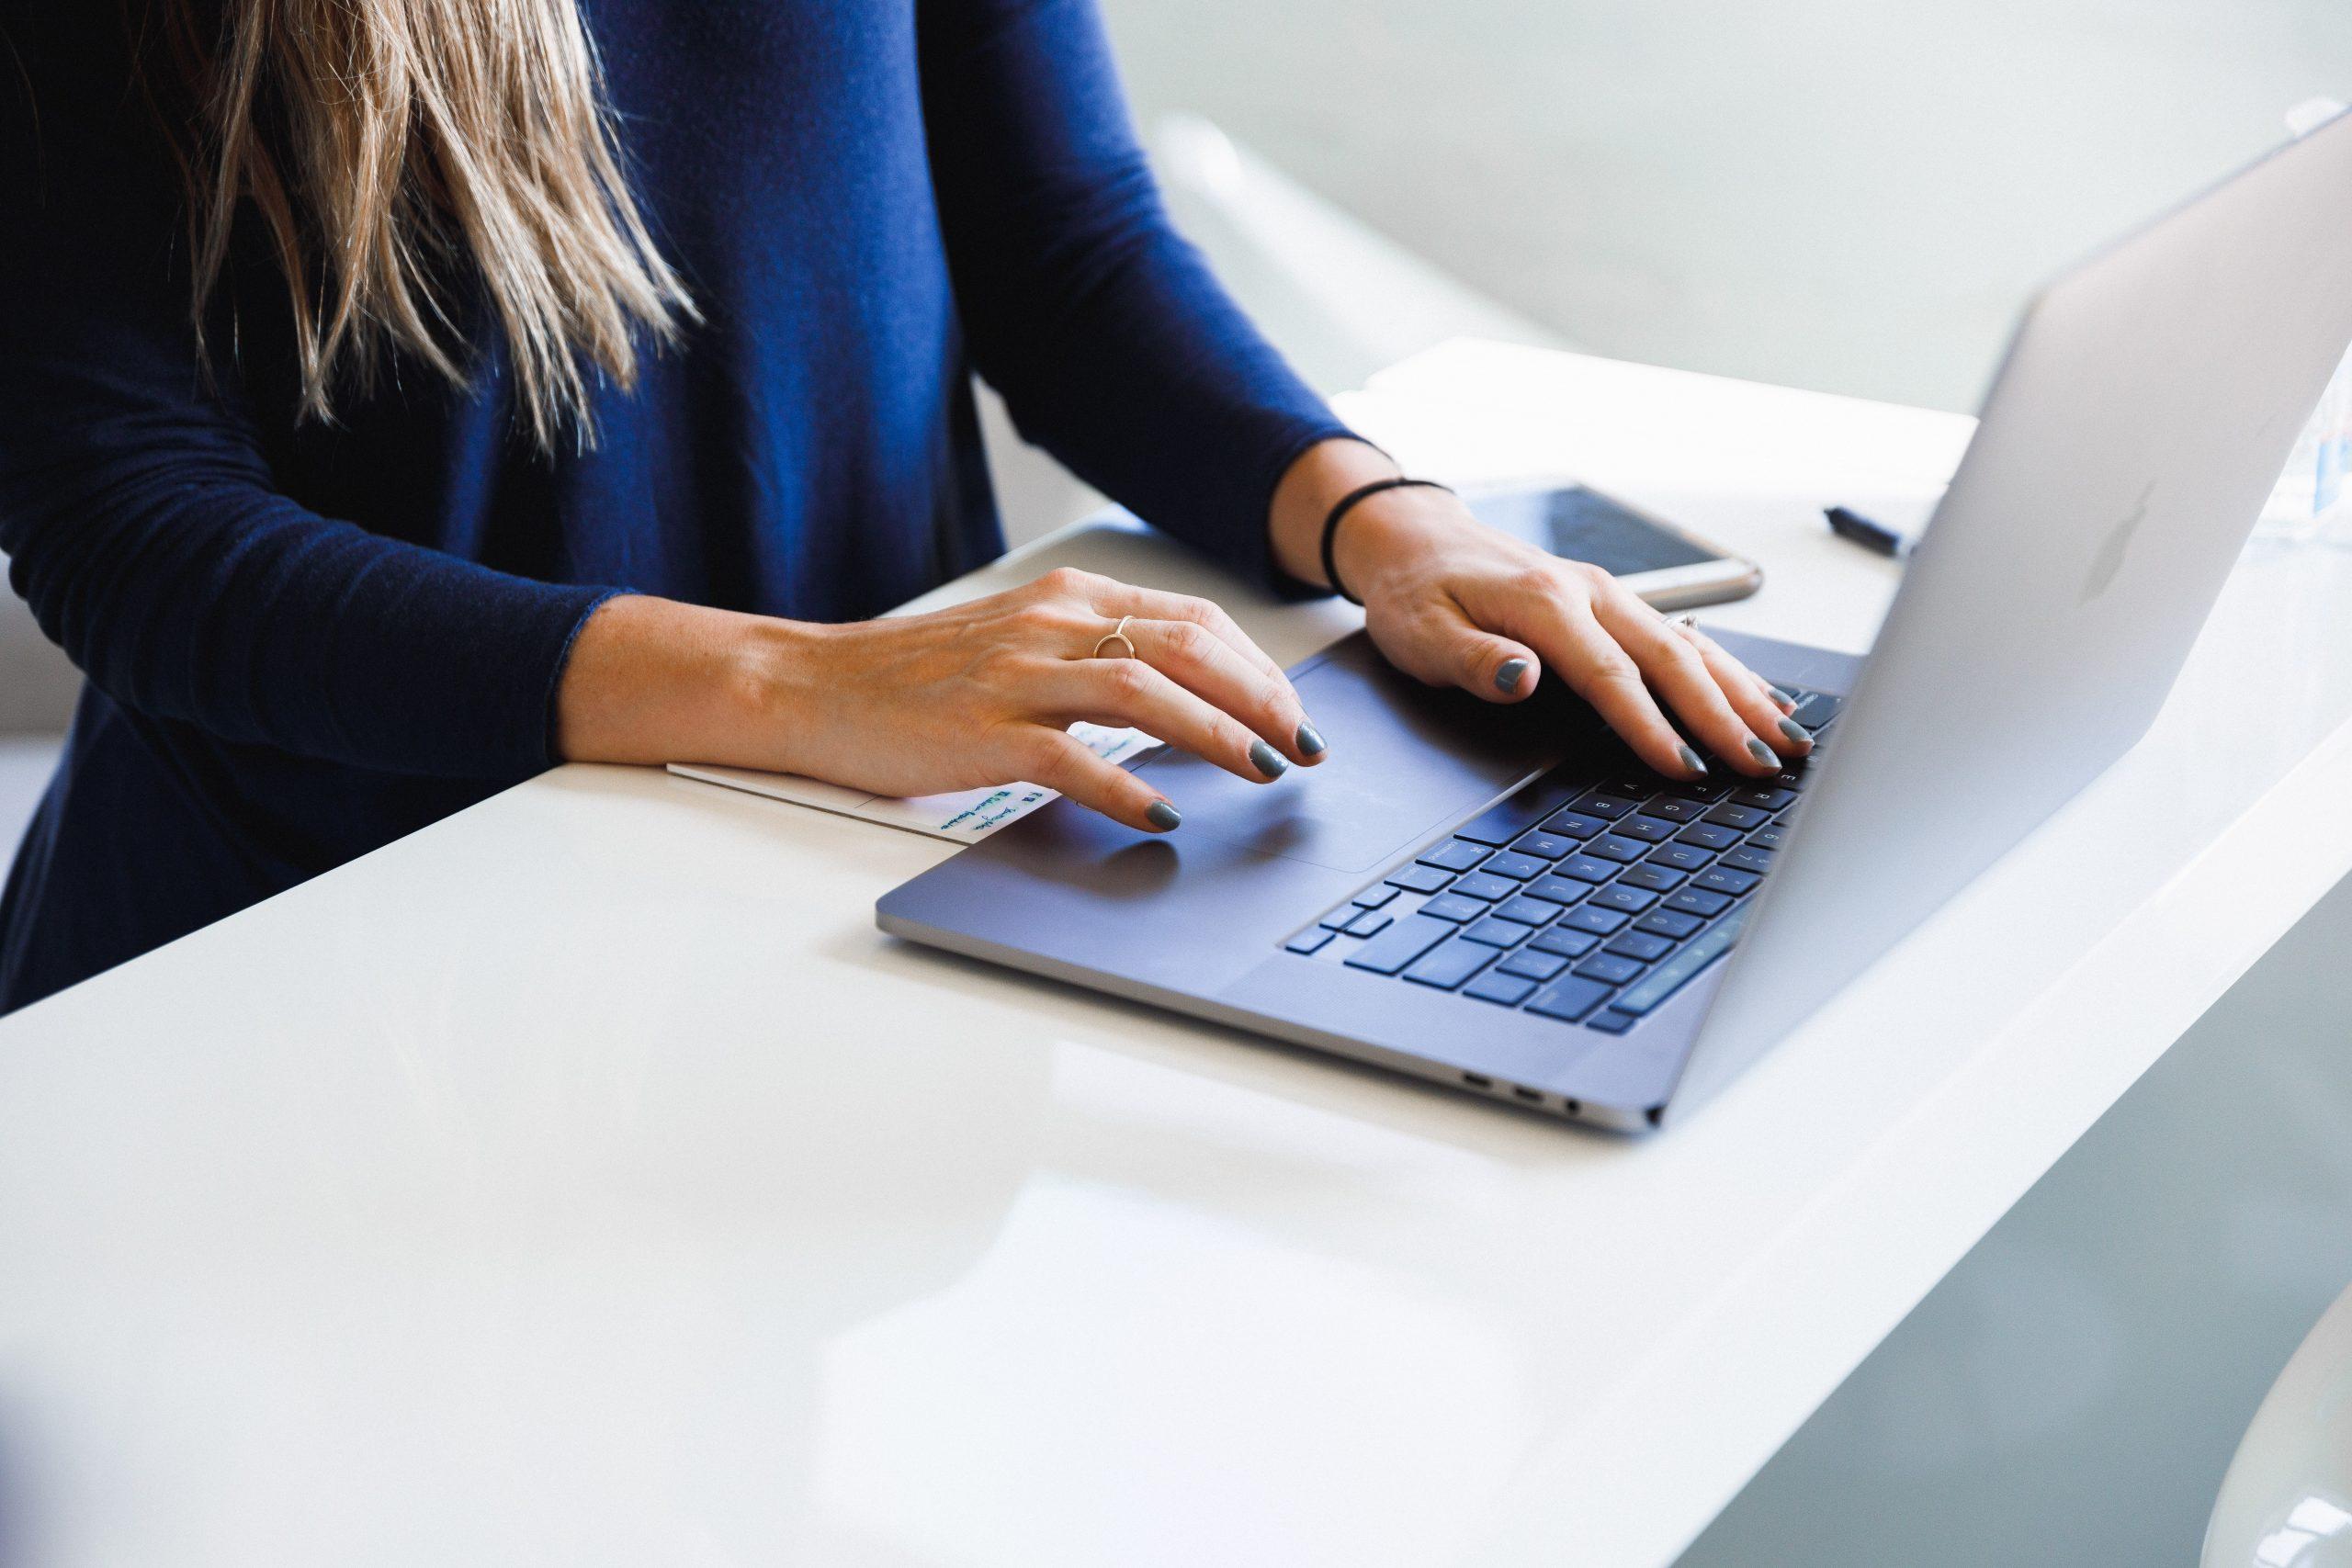 Agorapulse Review: Woman using social media management tool Agorapulse to manage online content